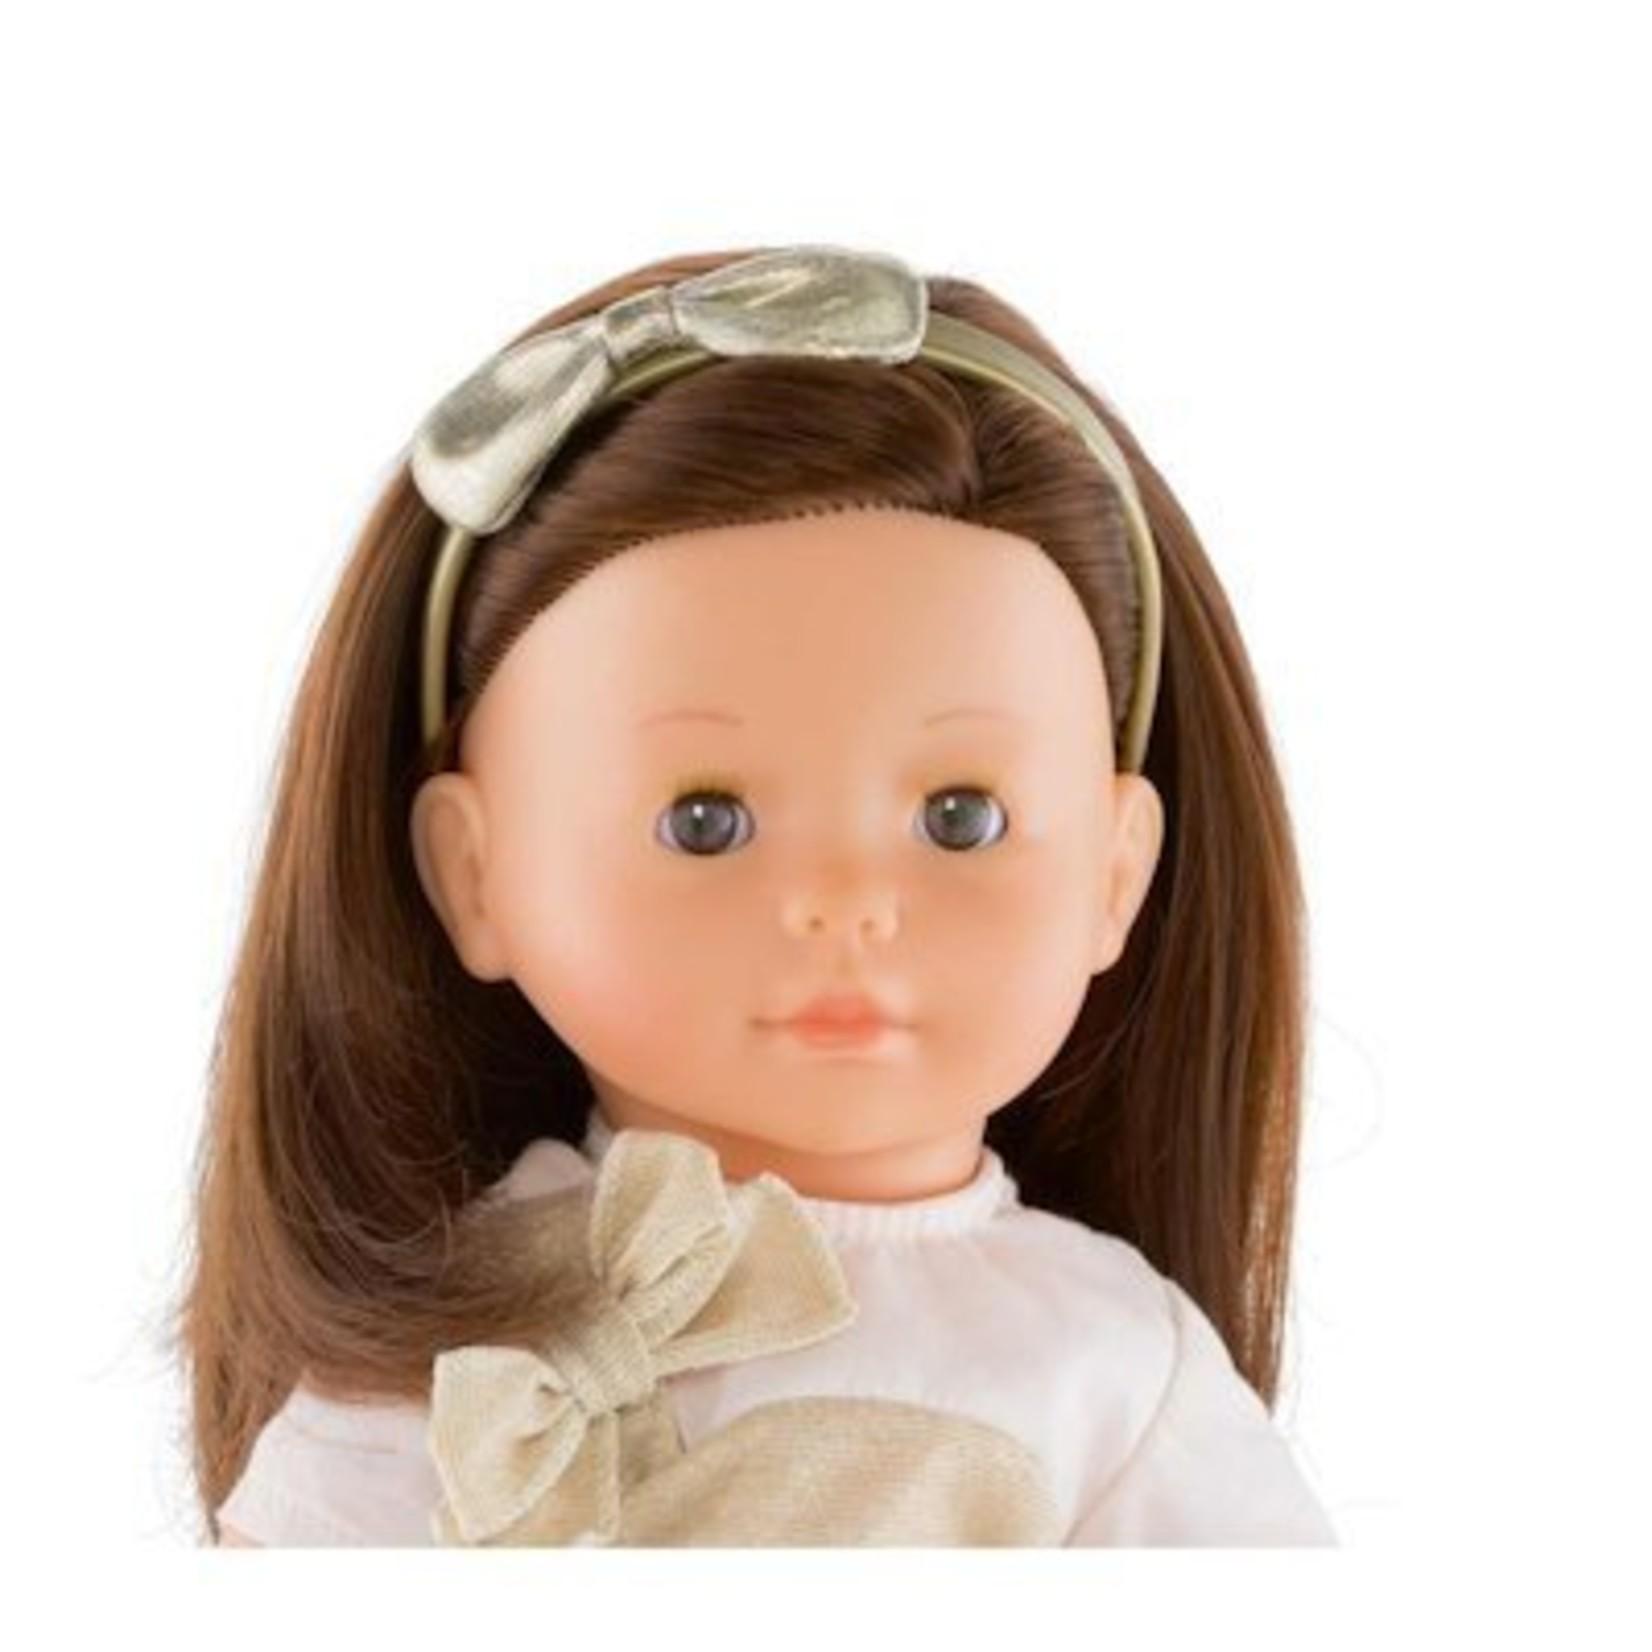 Corolle Goudkleurige haarband voor Ma Corolle poppen (36 cm)